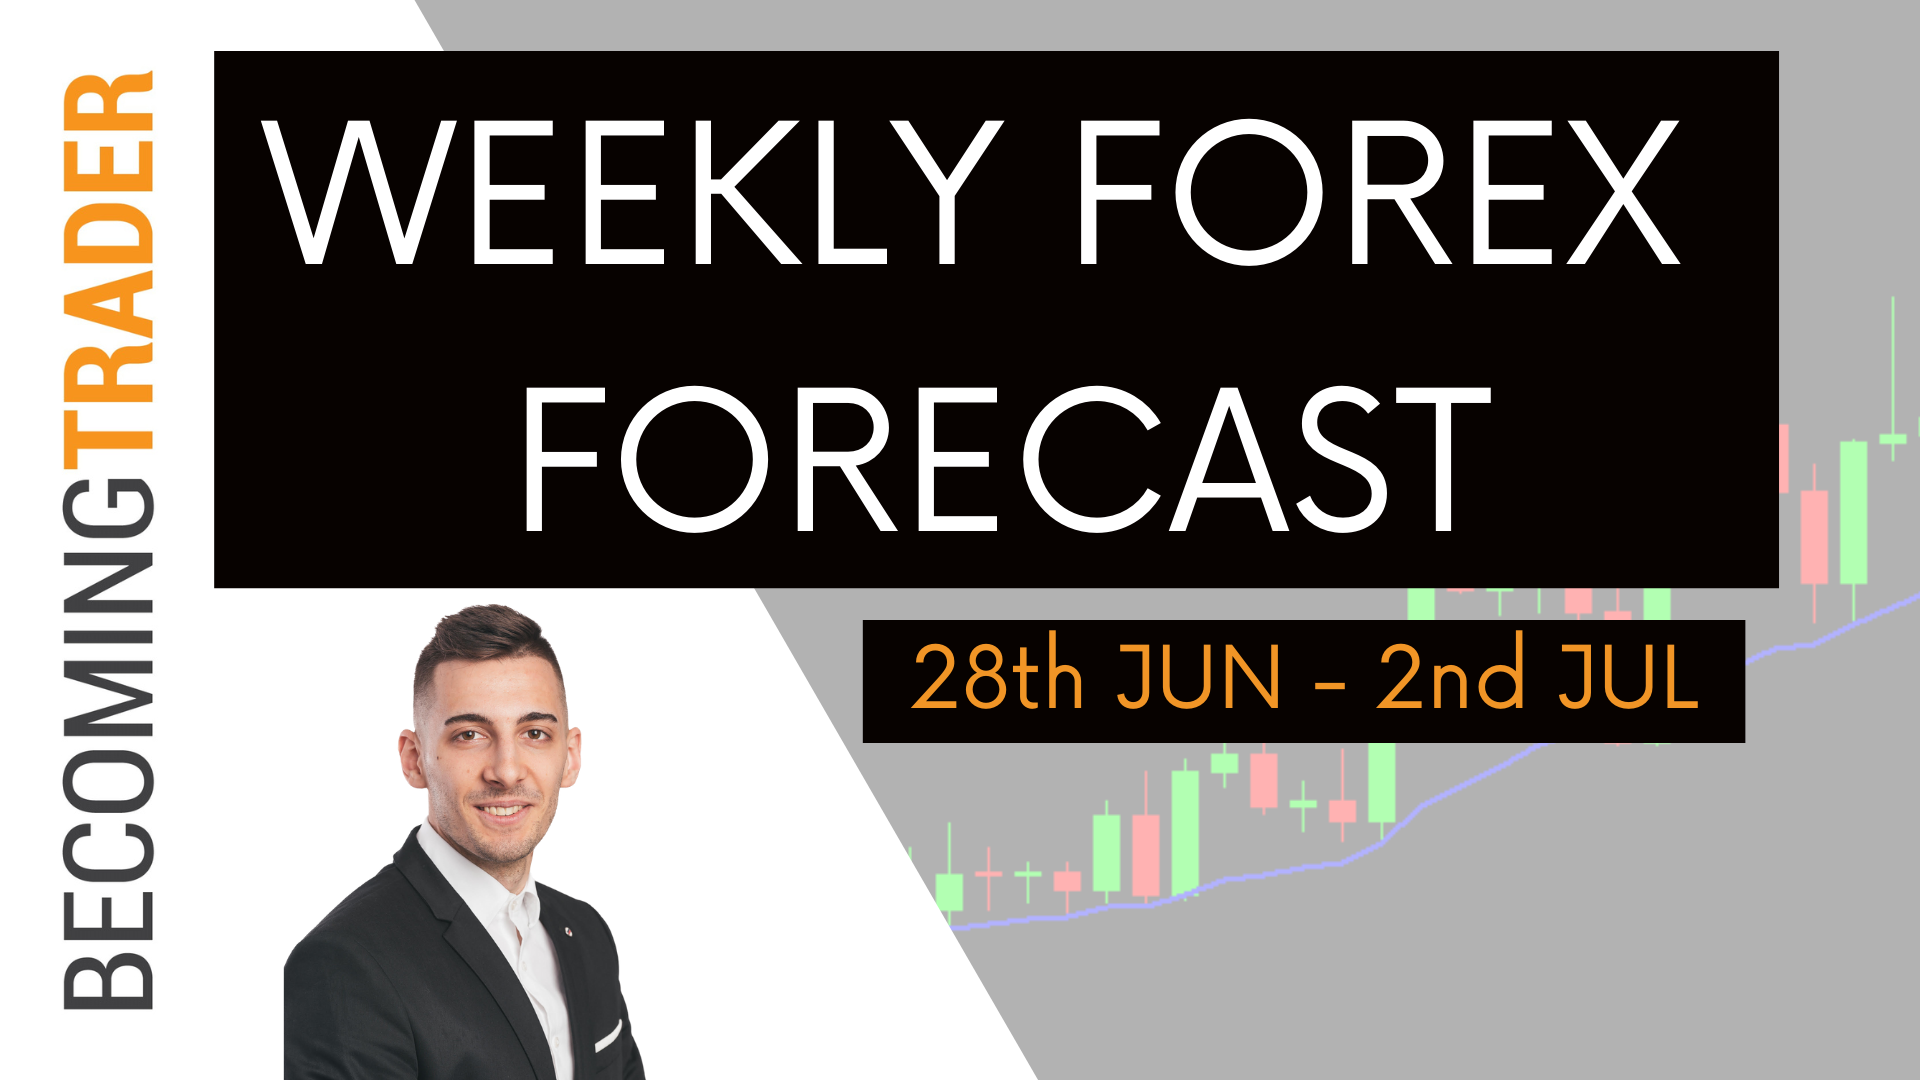 Weekly Forex Forecast 28th Jun to 2nd Jul 2021 | EURUSD , GBPUSD , AUDUSD , NZDUSD , USDCAD , USDJPY